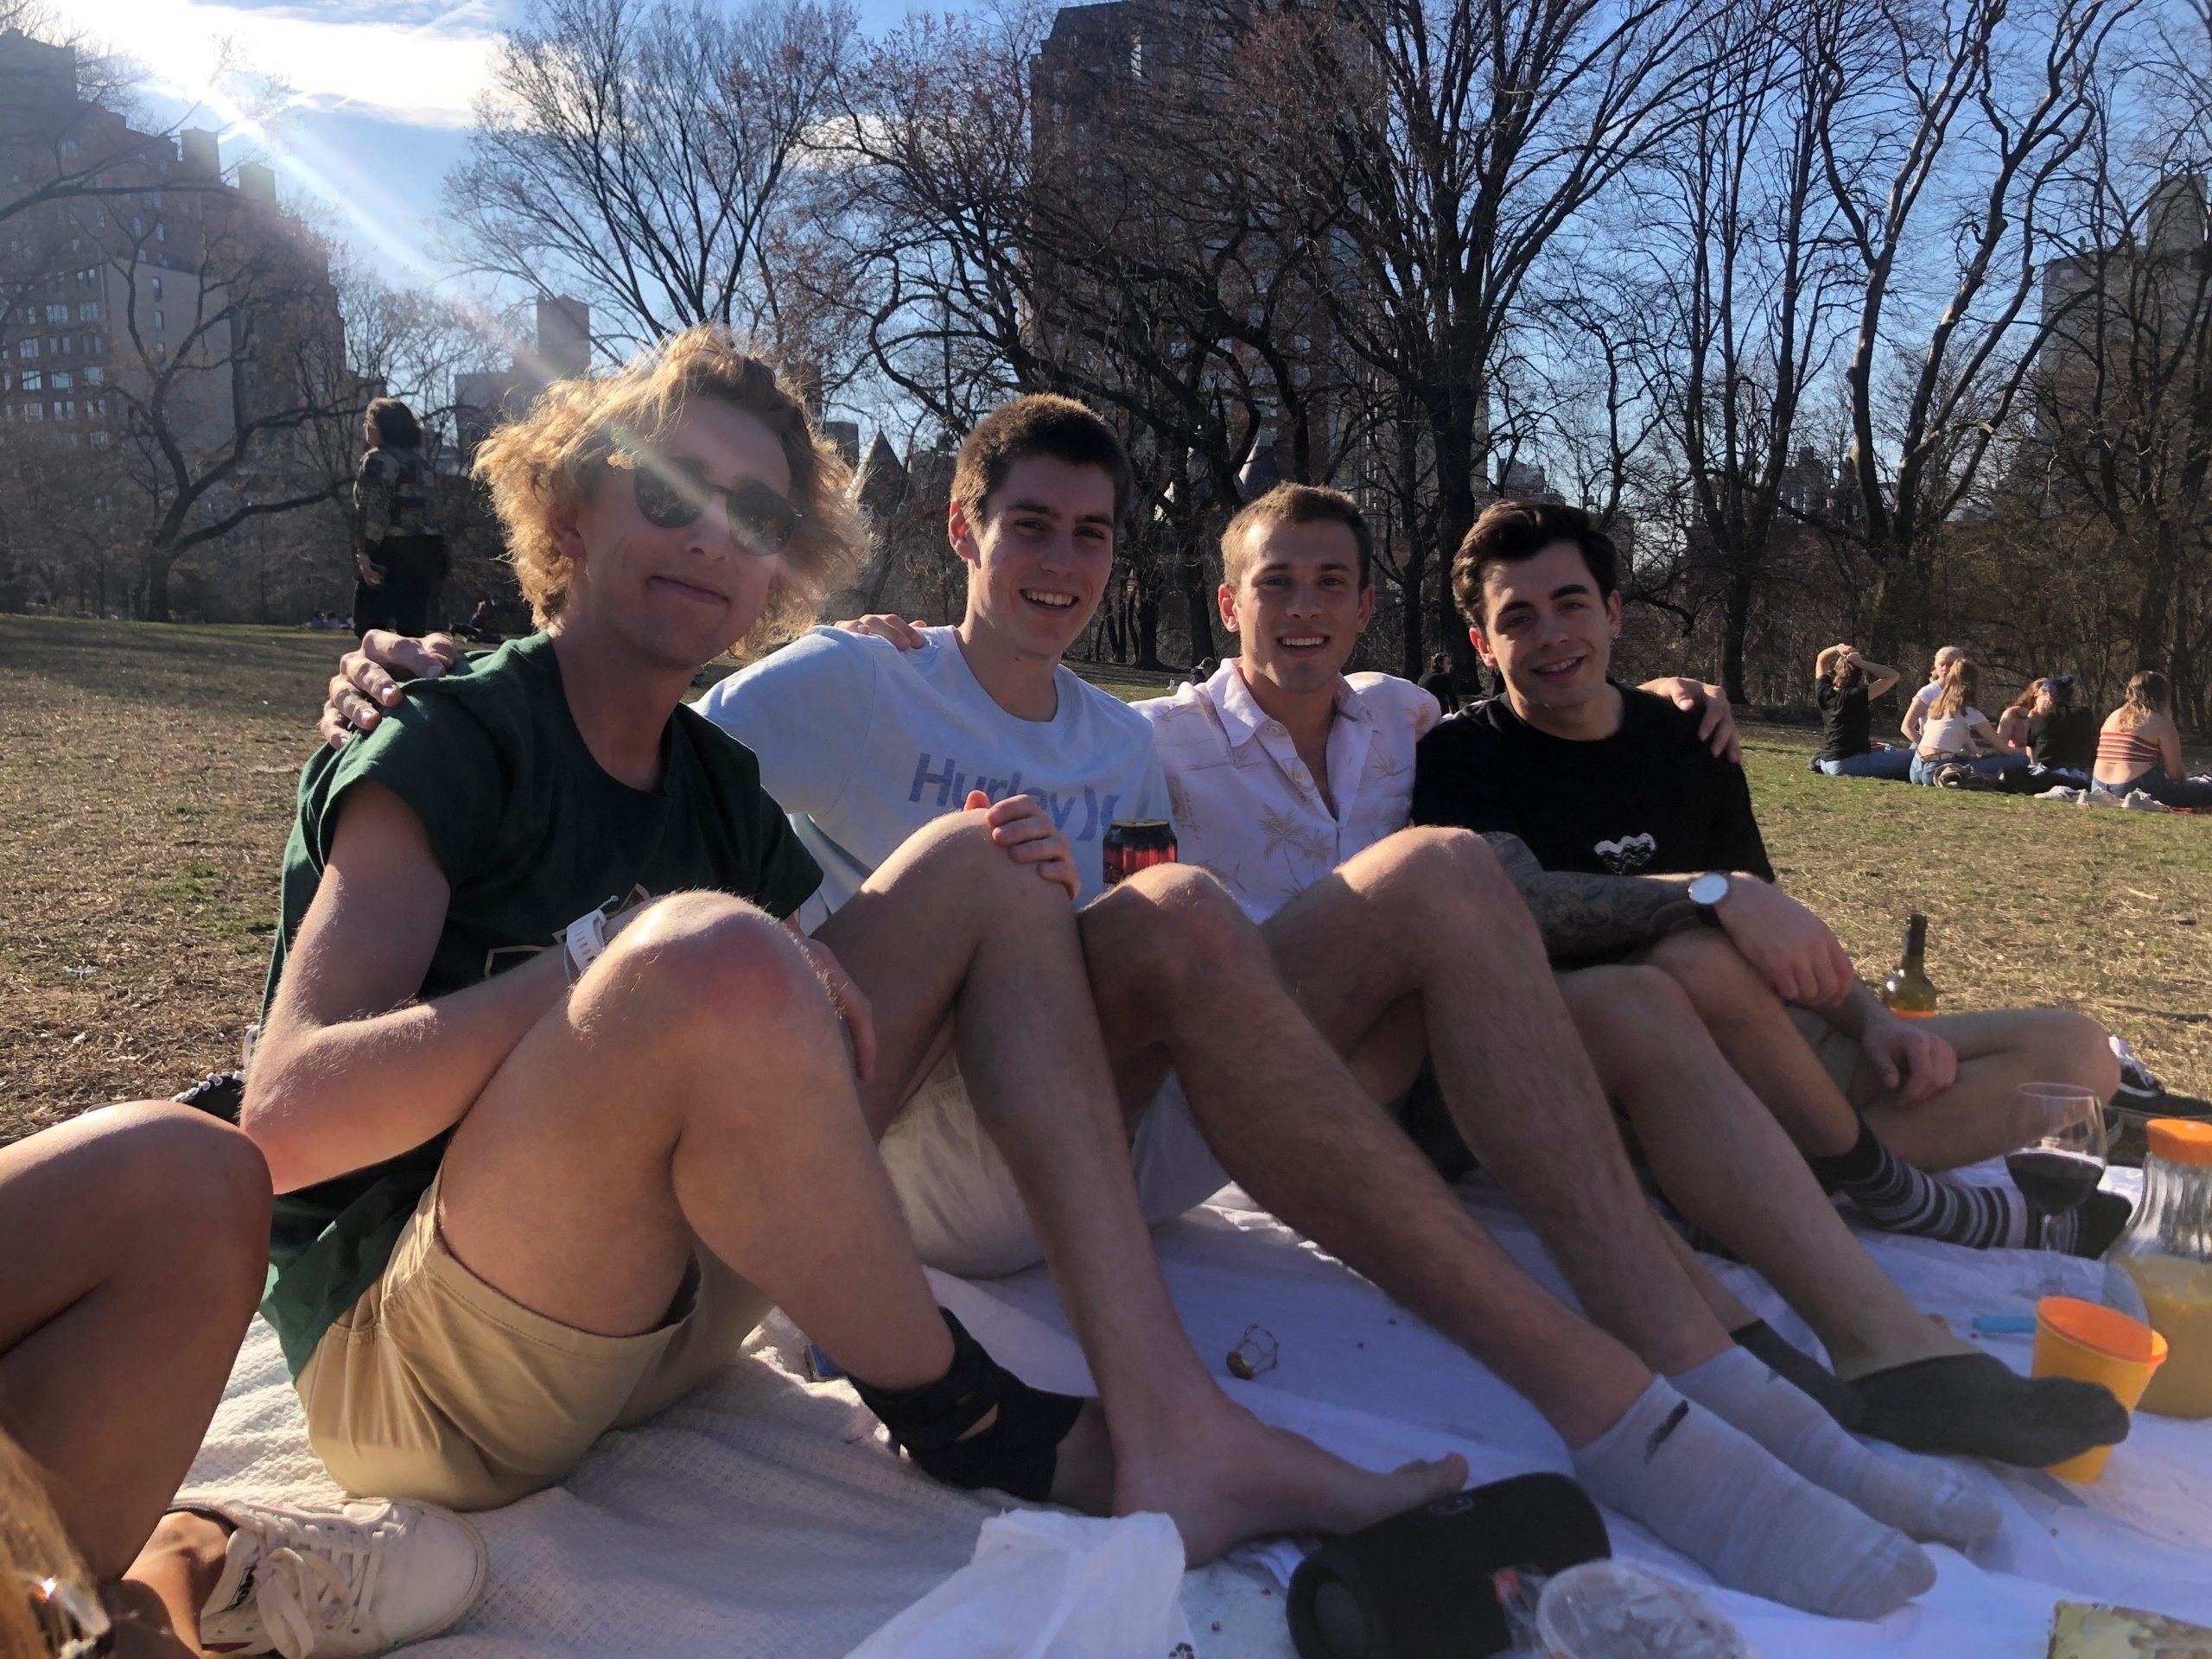 Owen Bishop, Dominic Dyer, Jackson Storey, and Jon Lauer at the park.